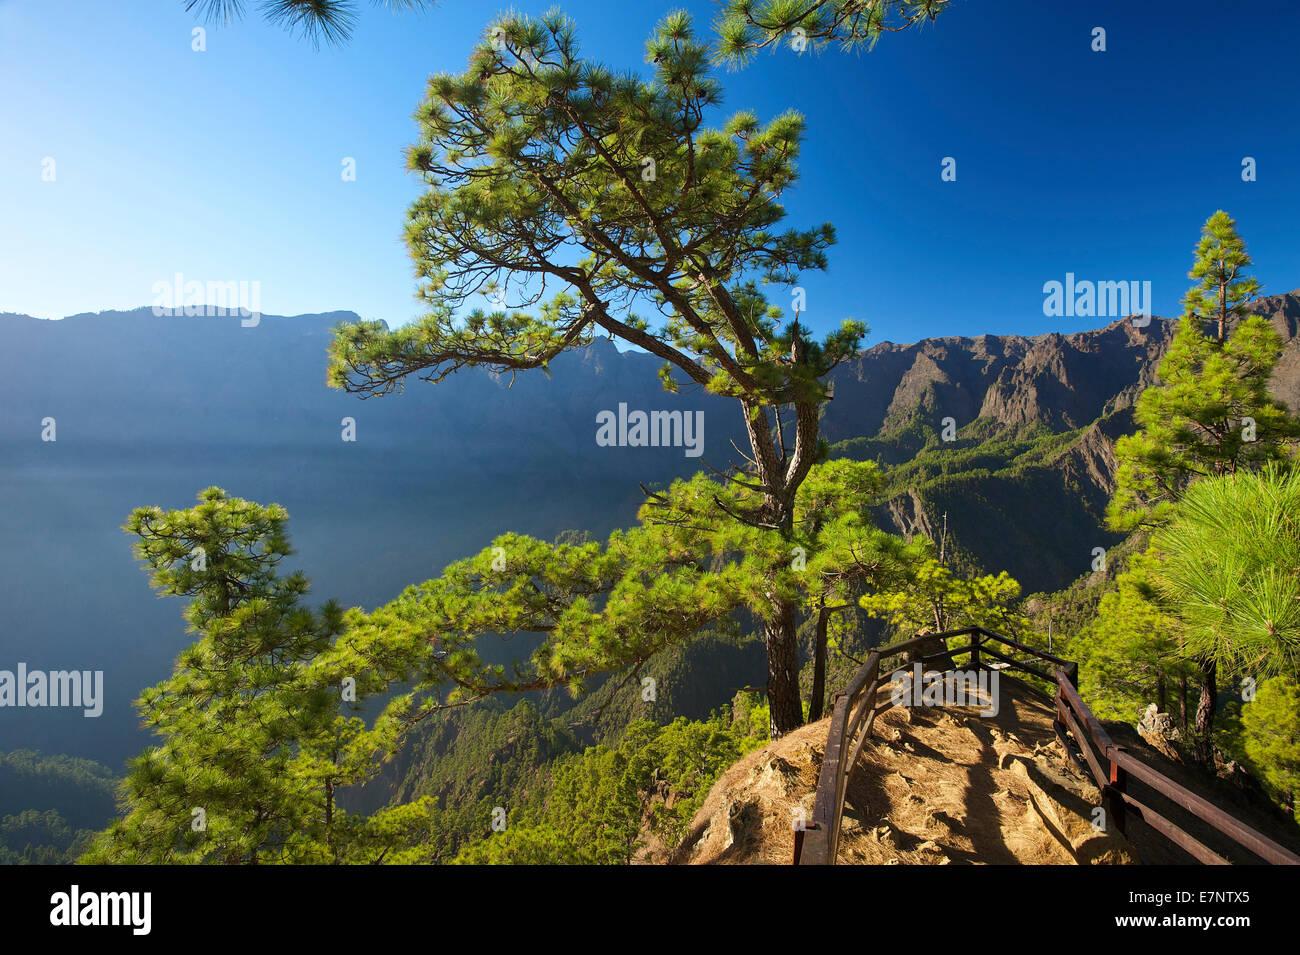 Kanaren, Kanarische Inseln, Inseln, La Palma, Spanien, Europa, draußen, Tag, niemand, Parque Nacional De La Stockbild